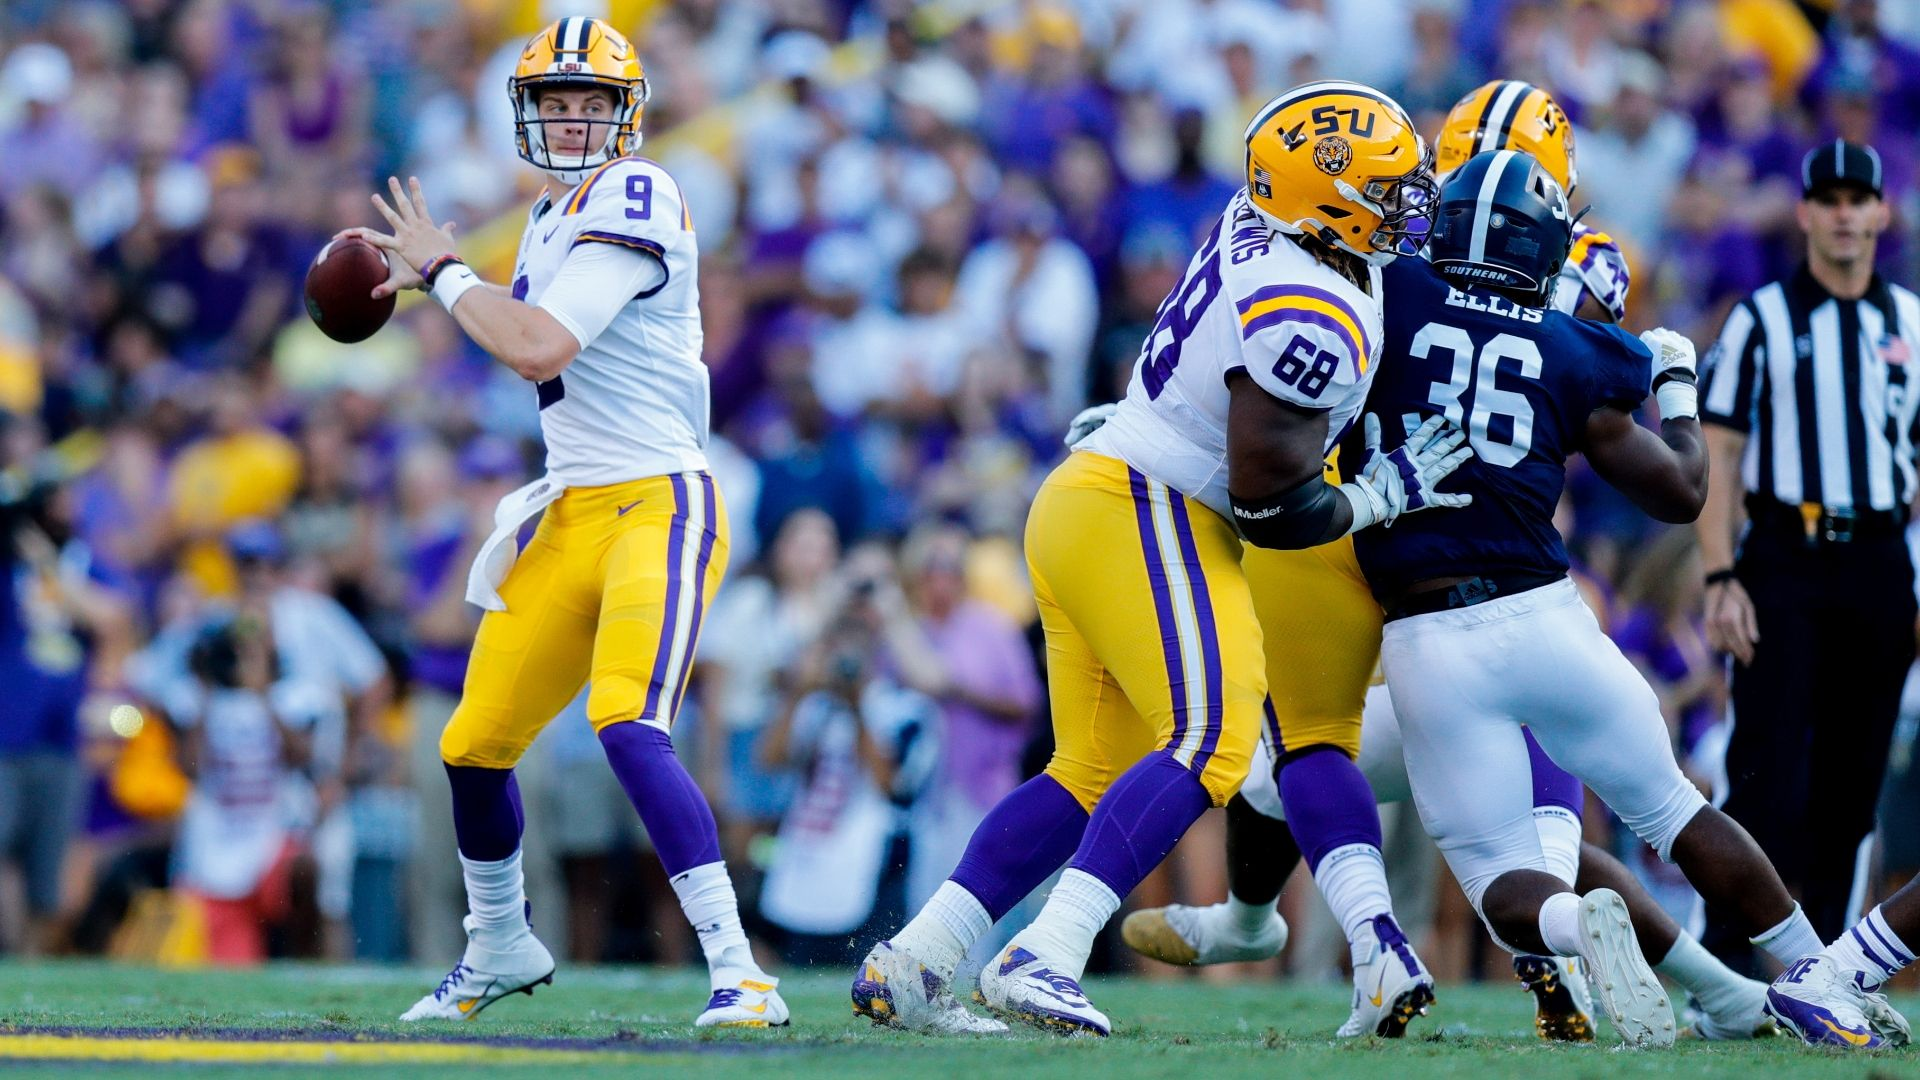 LSU quarterback Joe Burrow Peach Bowl